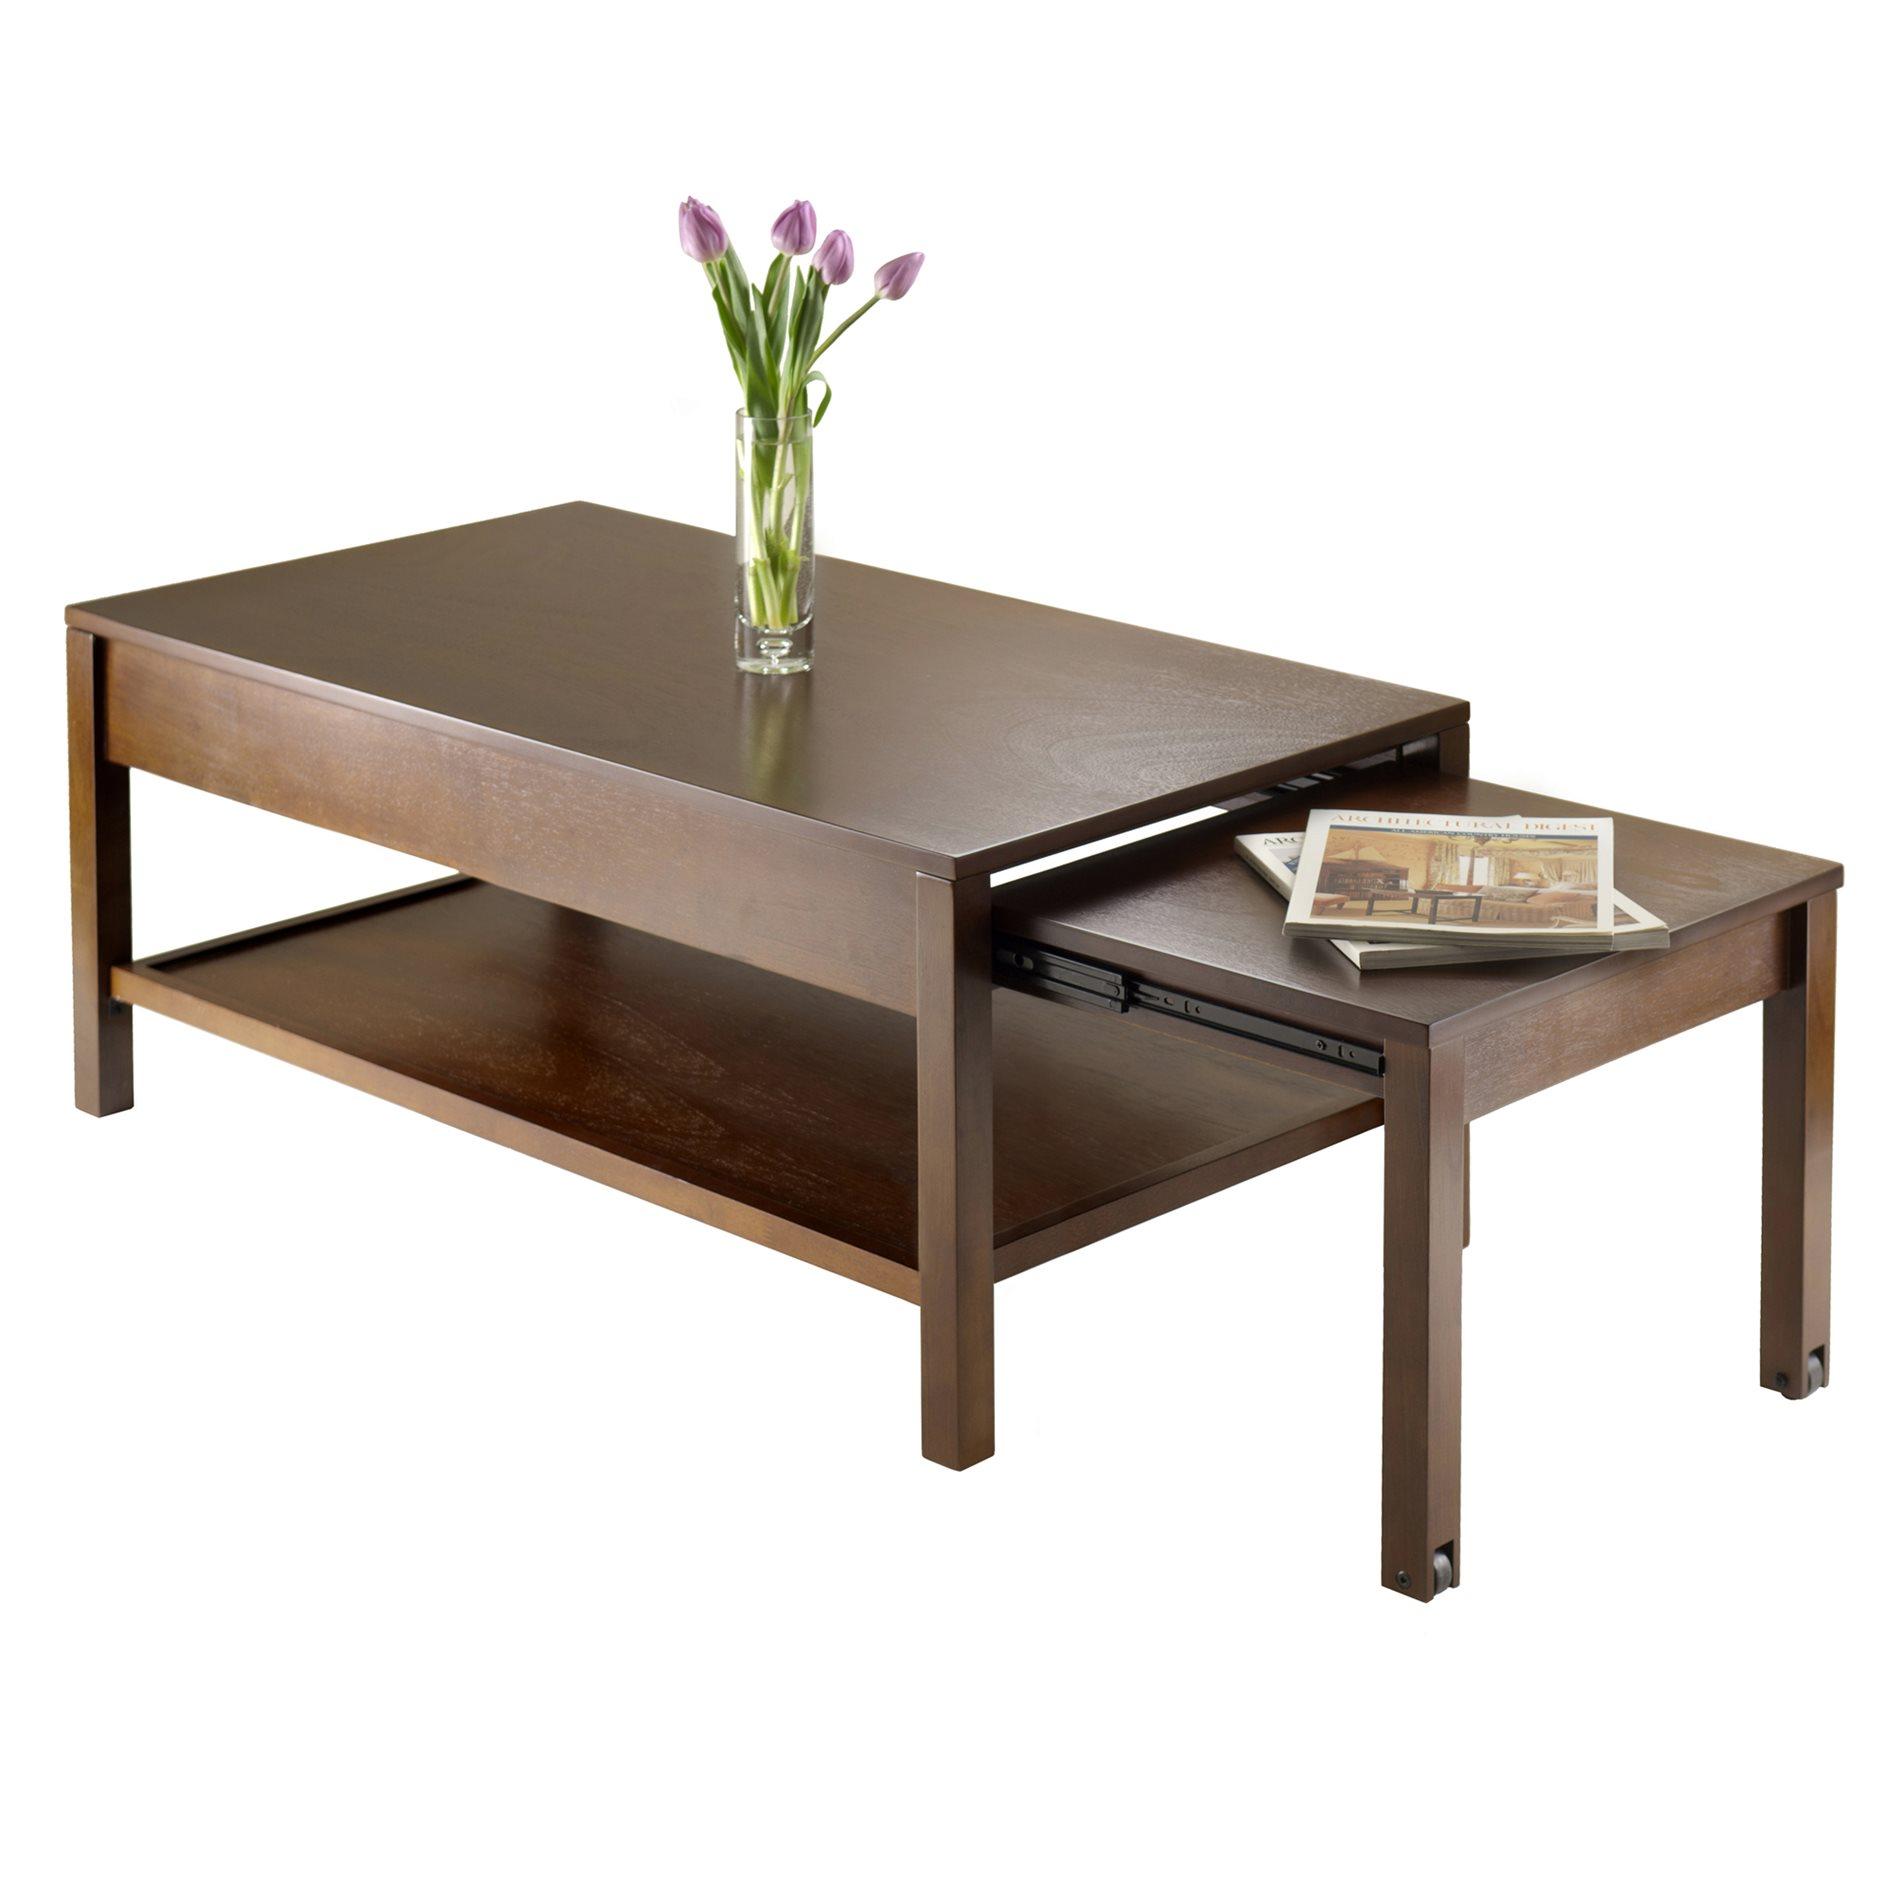 Winsome Wood 94856 Brandon Coffee Table Winw 94856